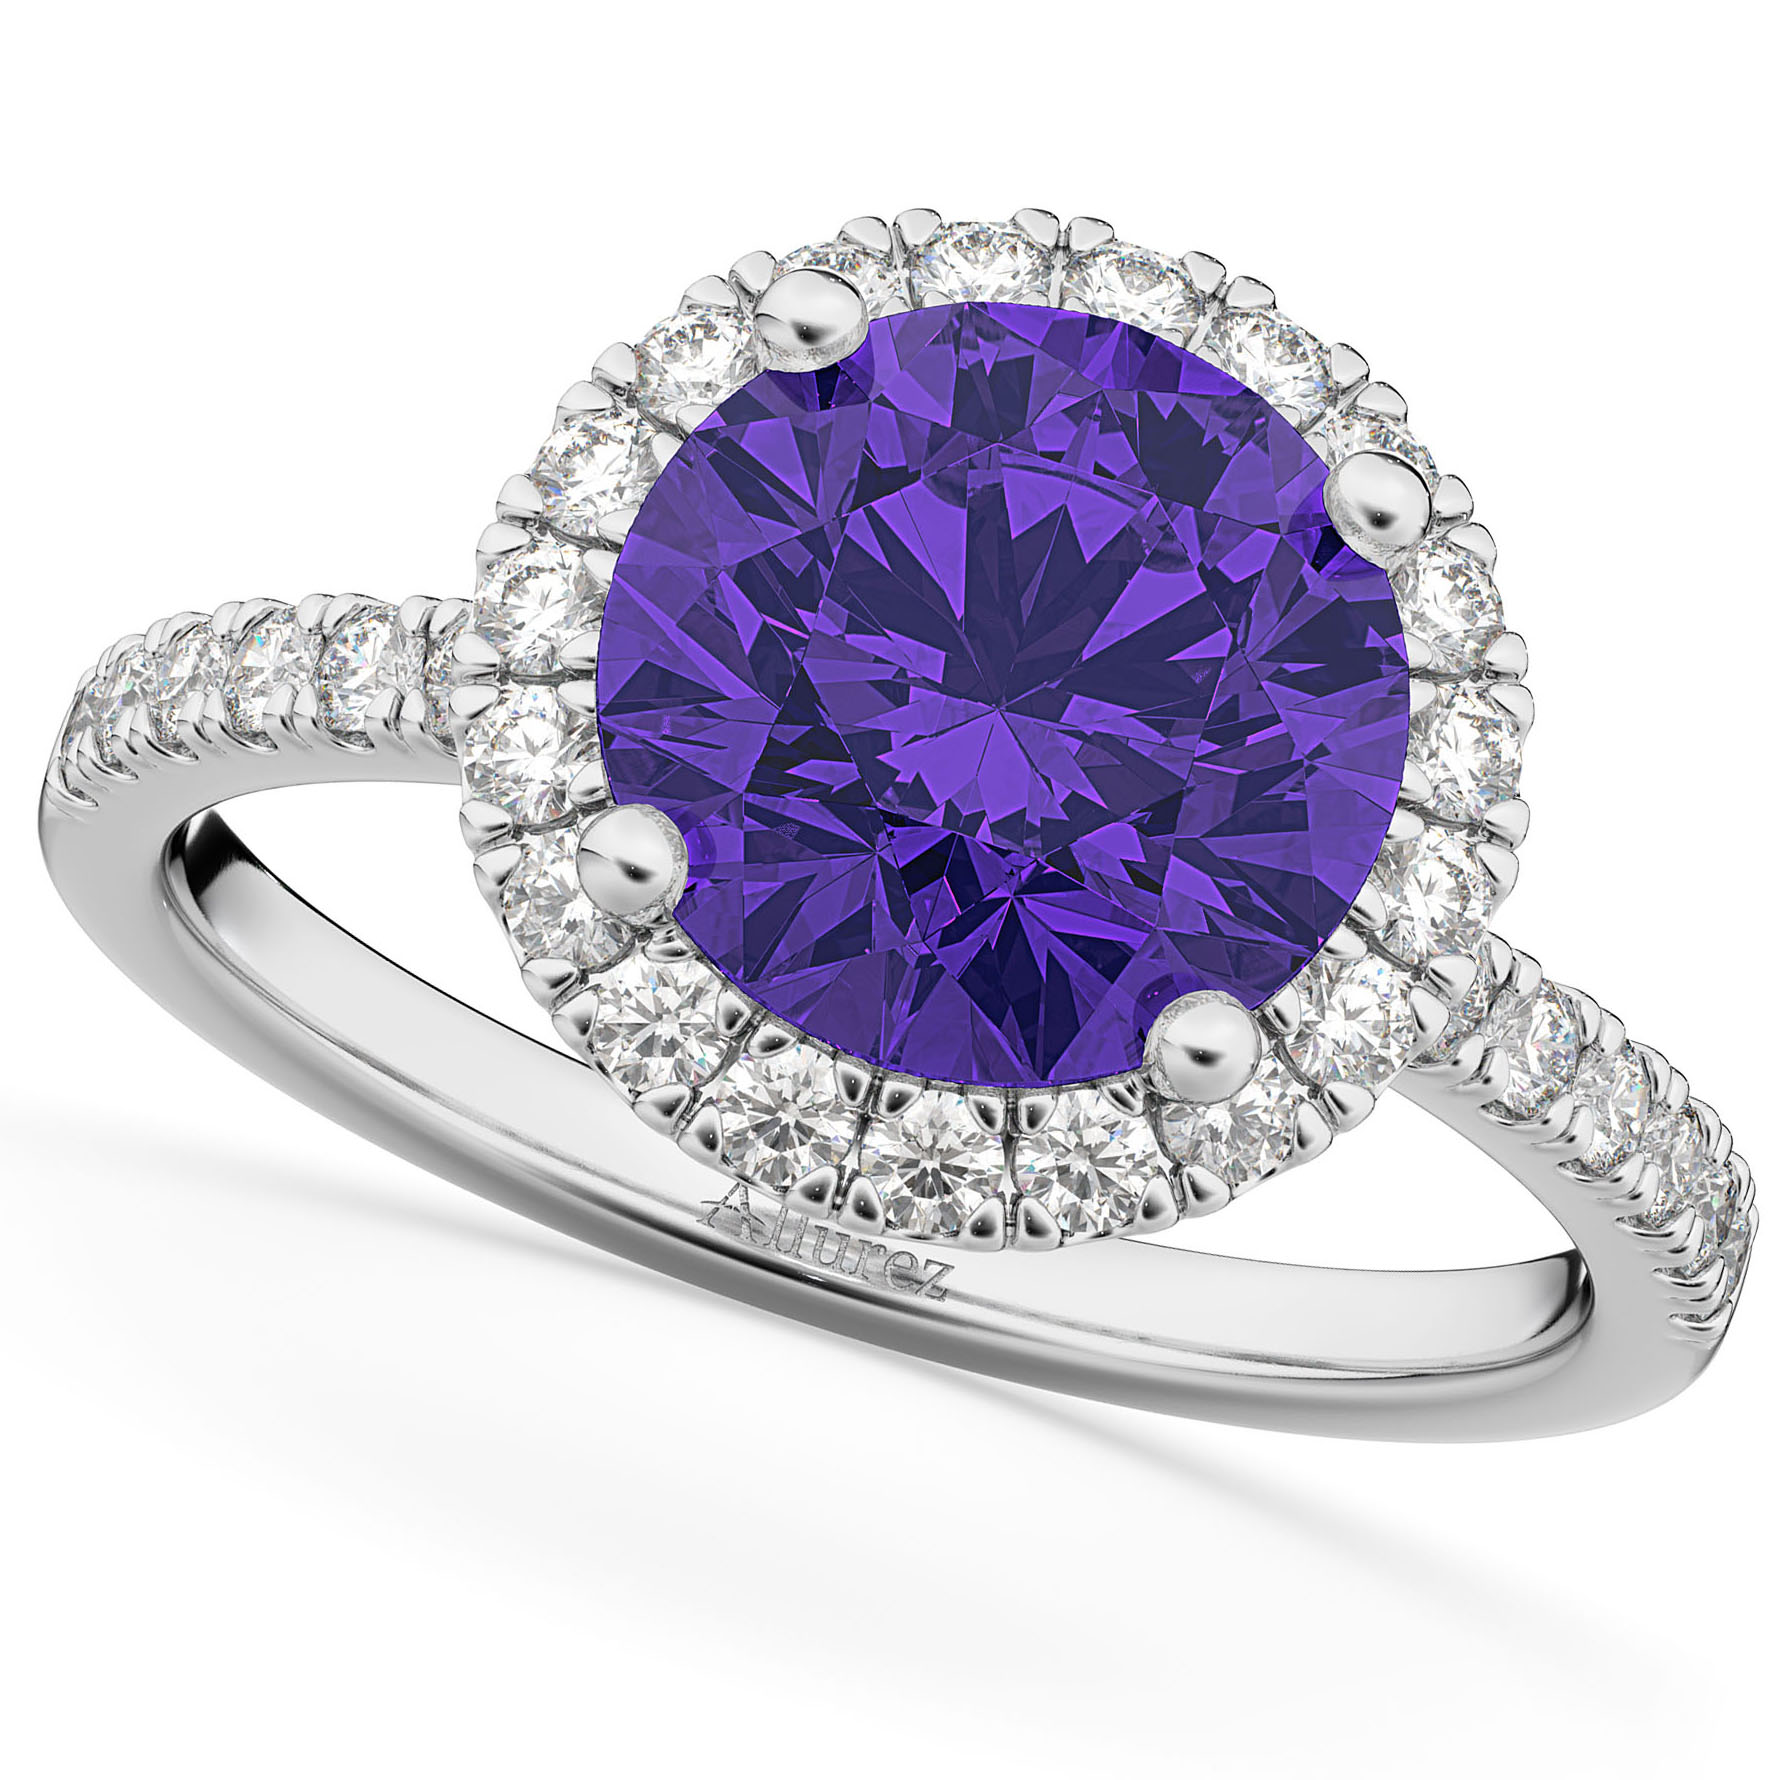 Halo Tanzanite & Diamond Engagement Ring 18K White Gold 2.80ct